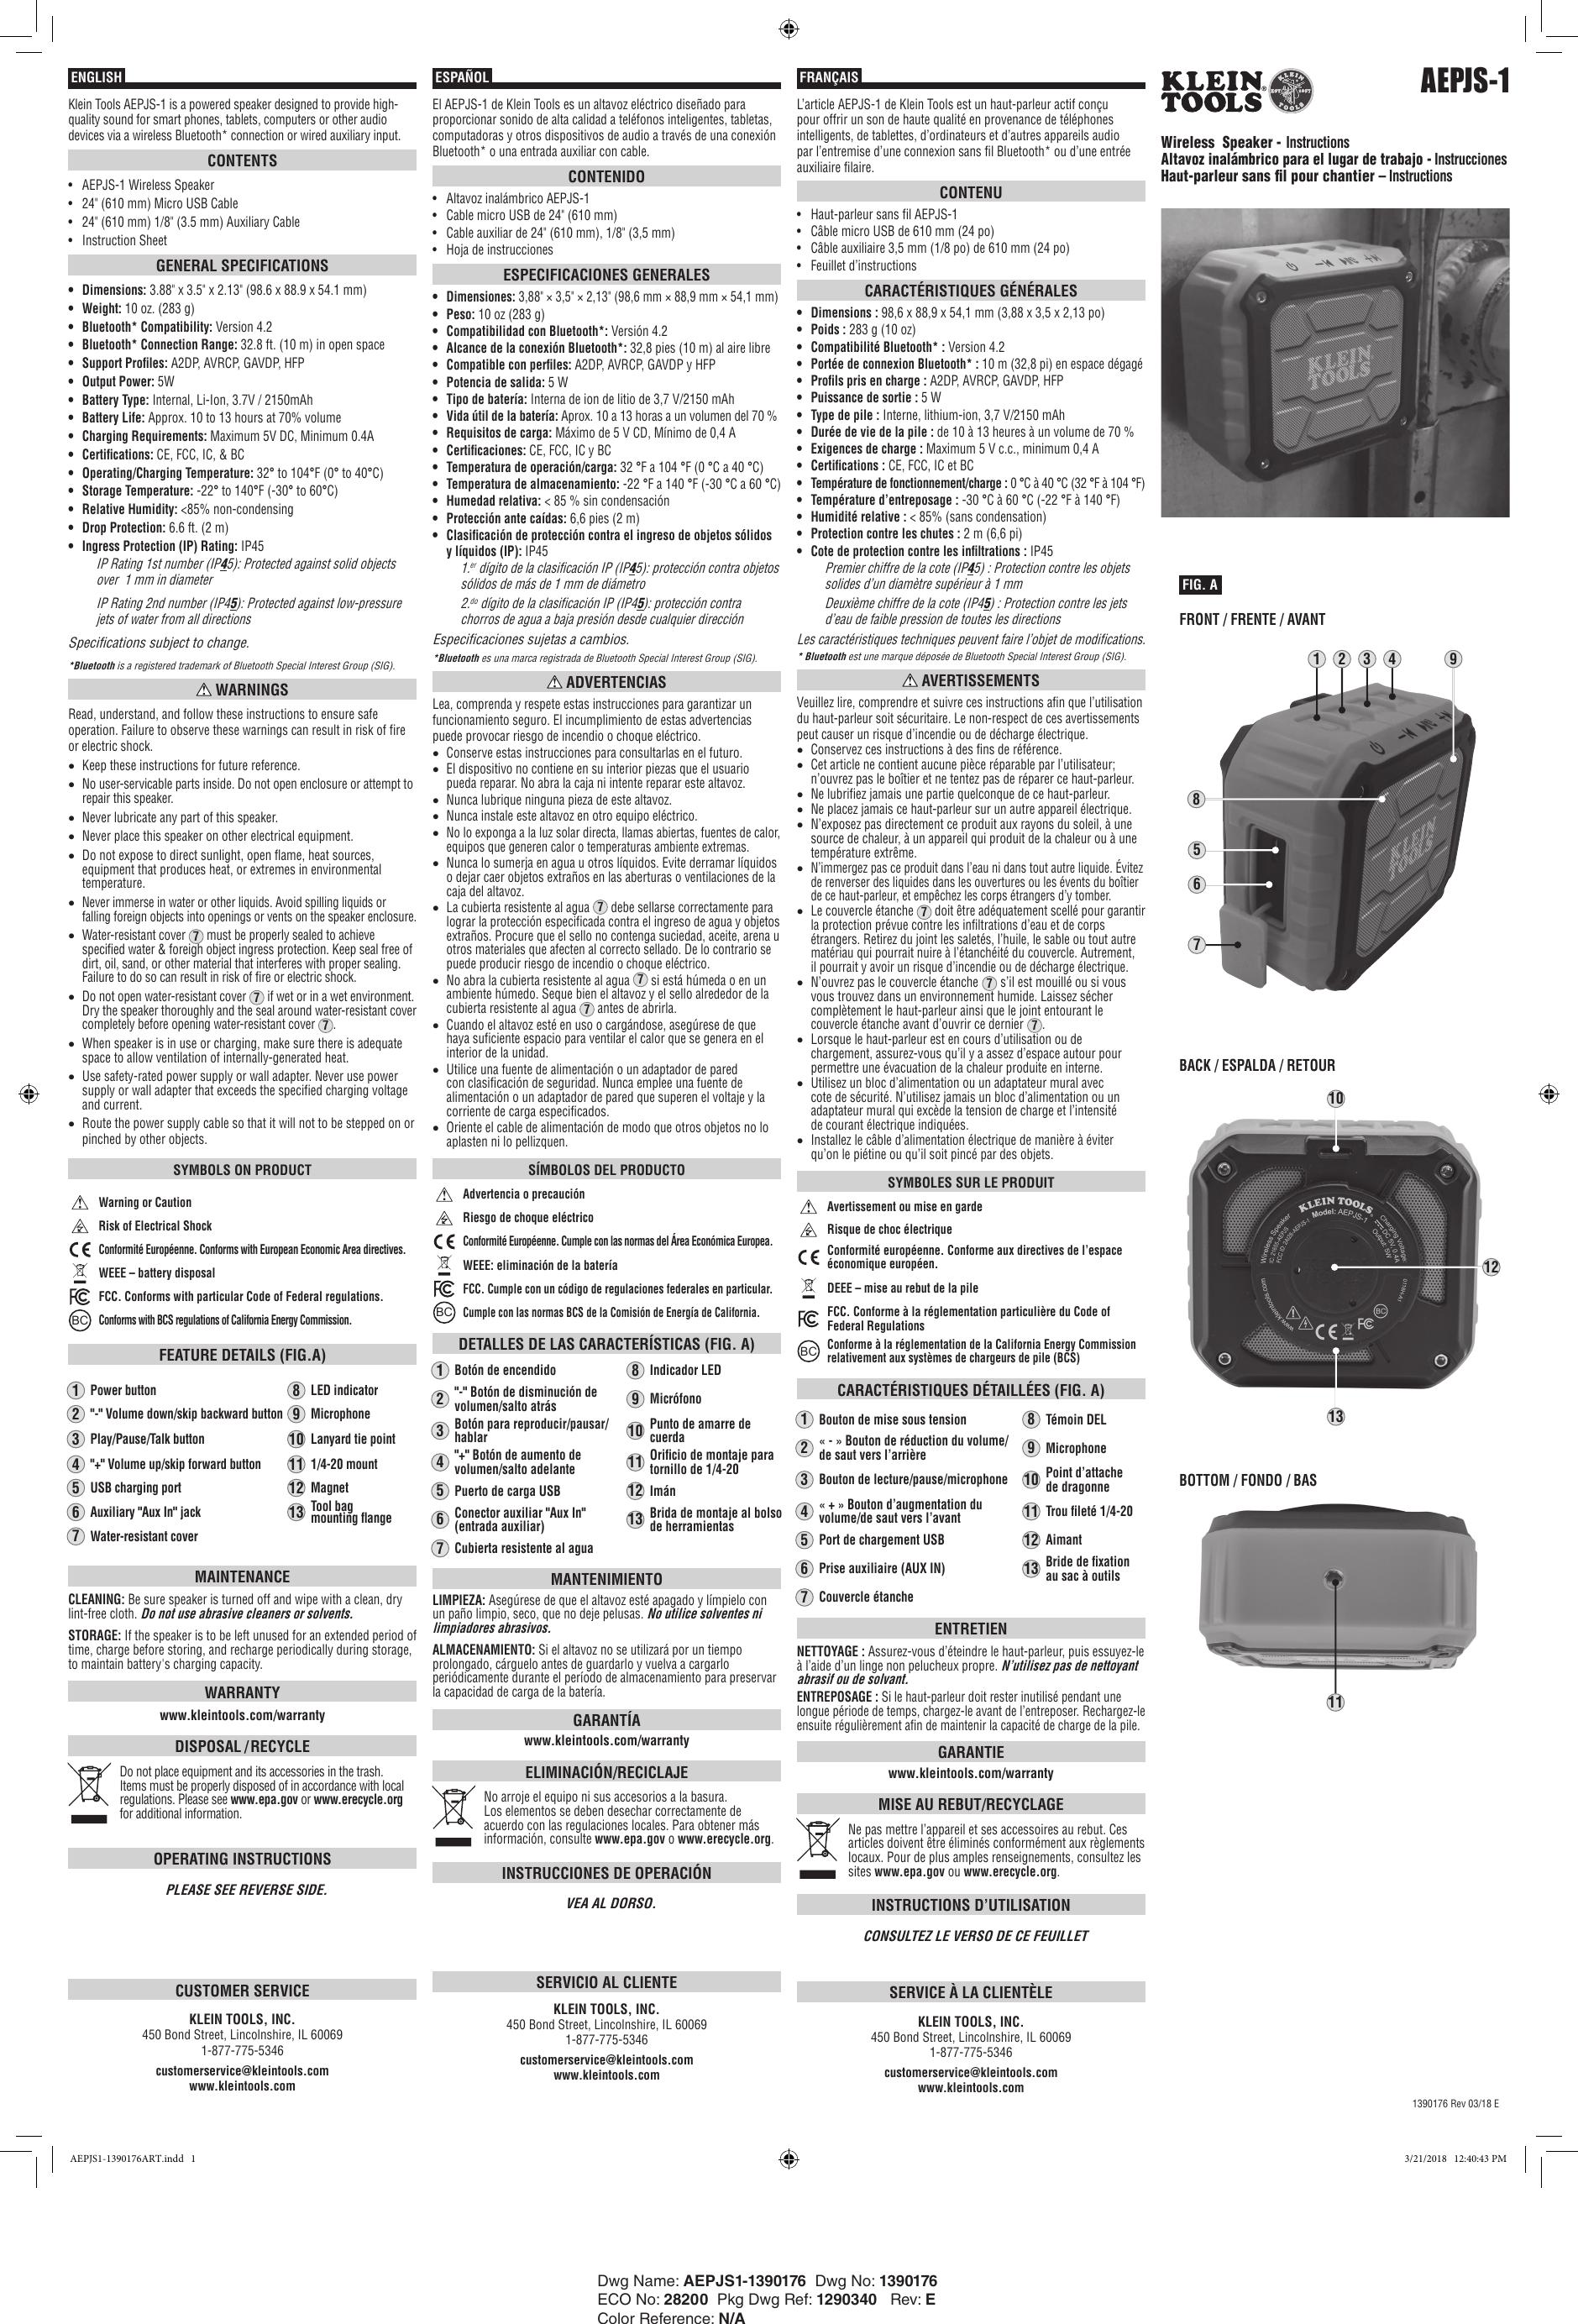 klein tools ncvt 2 user manual